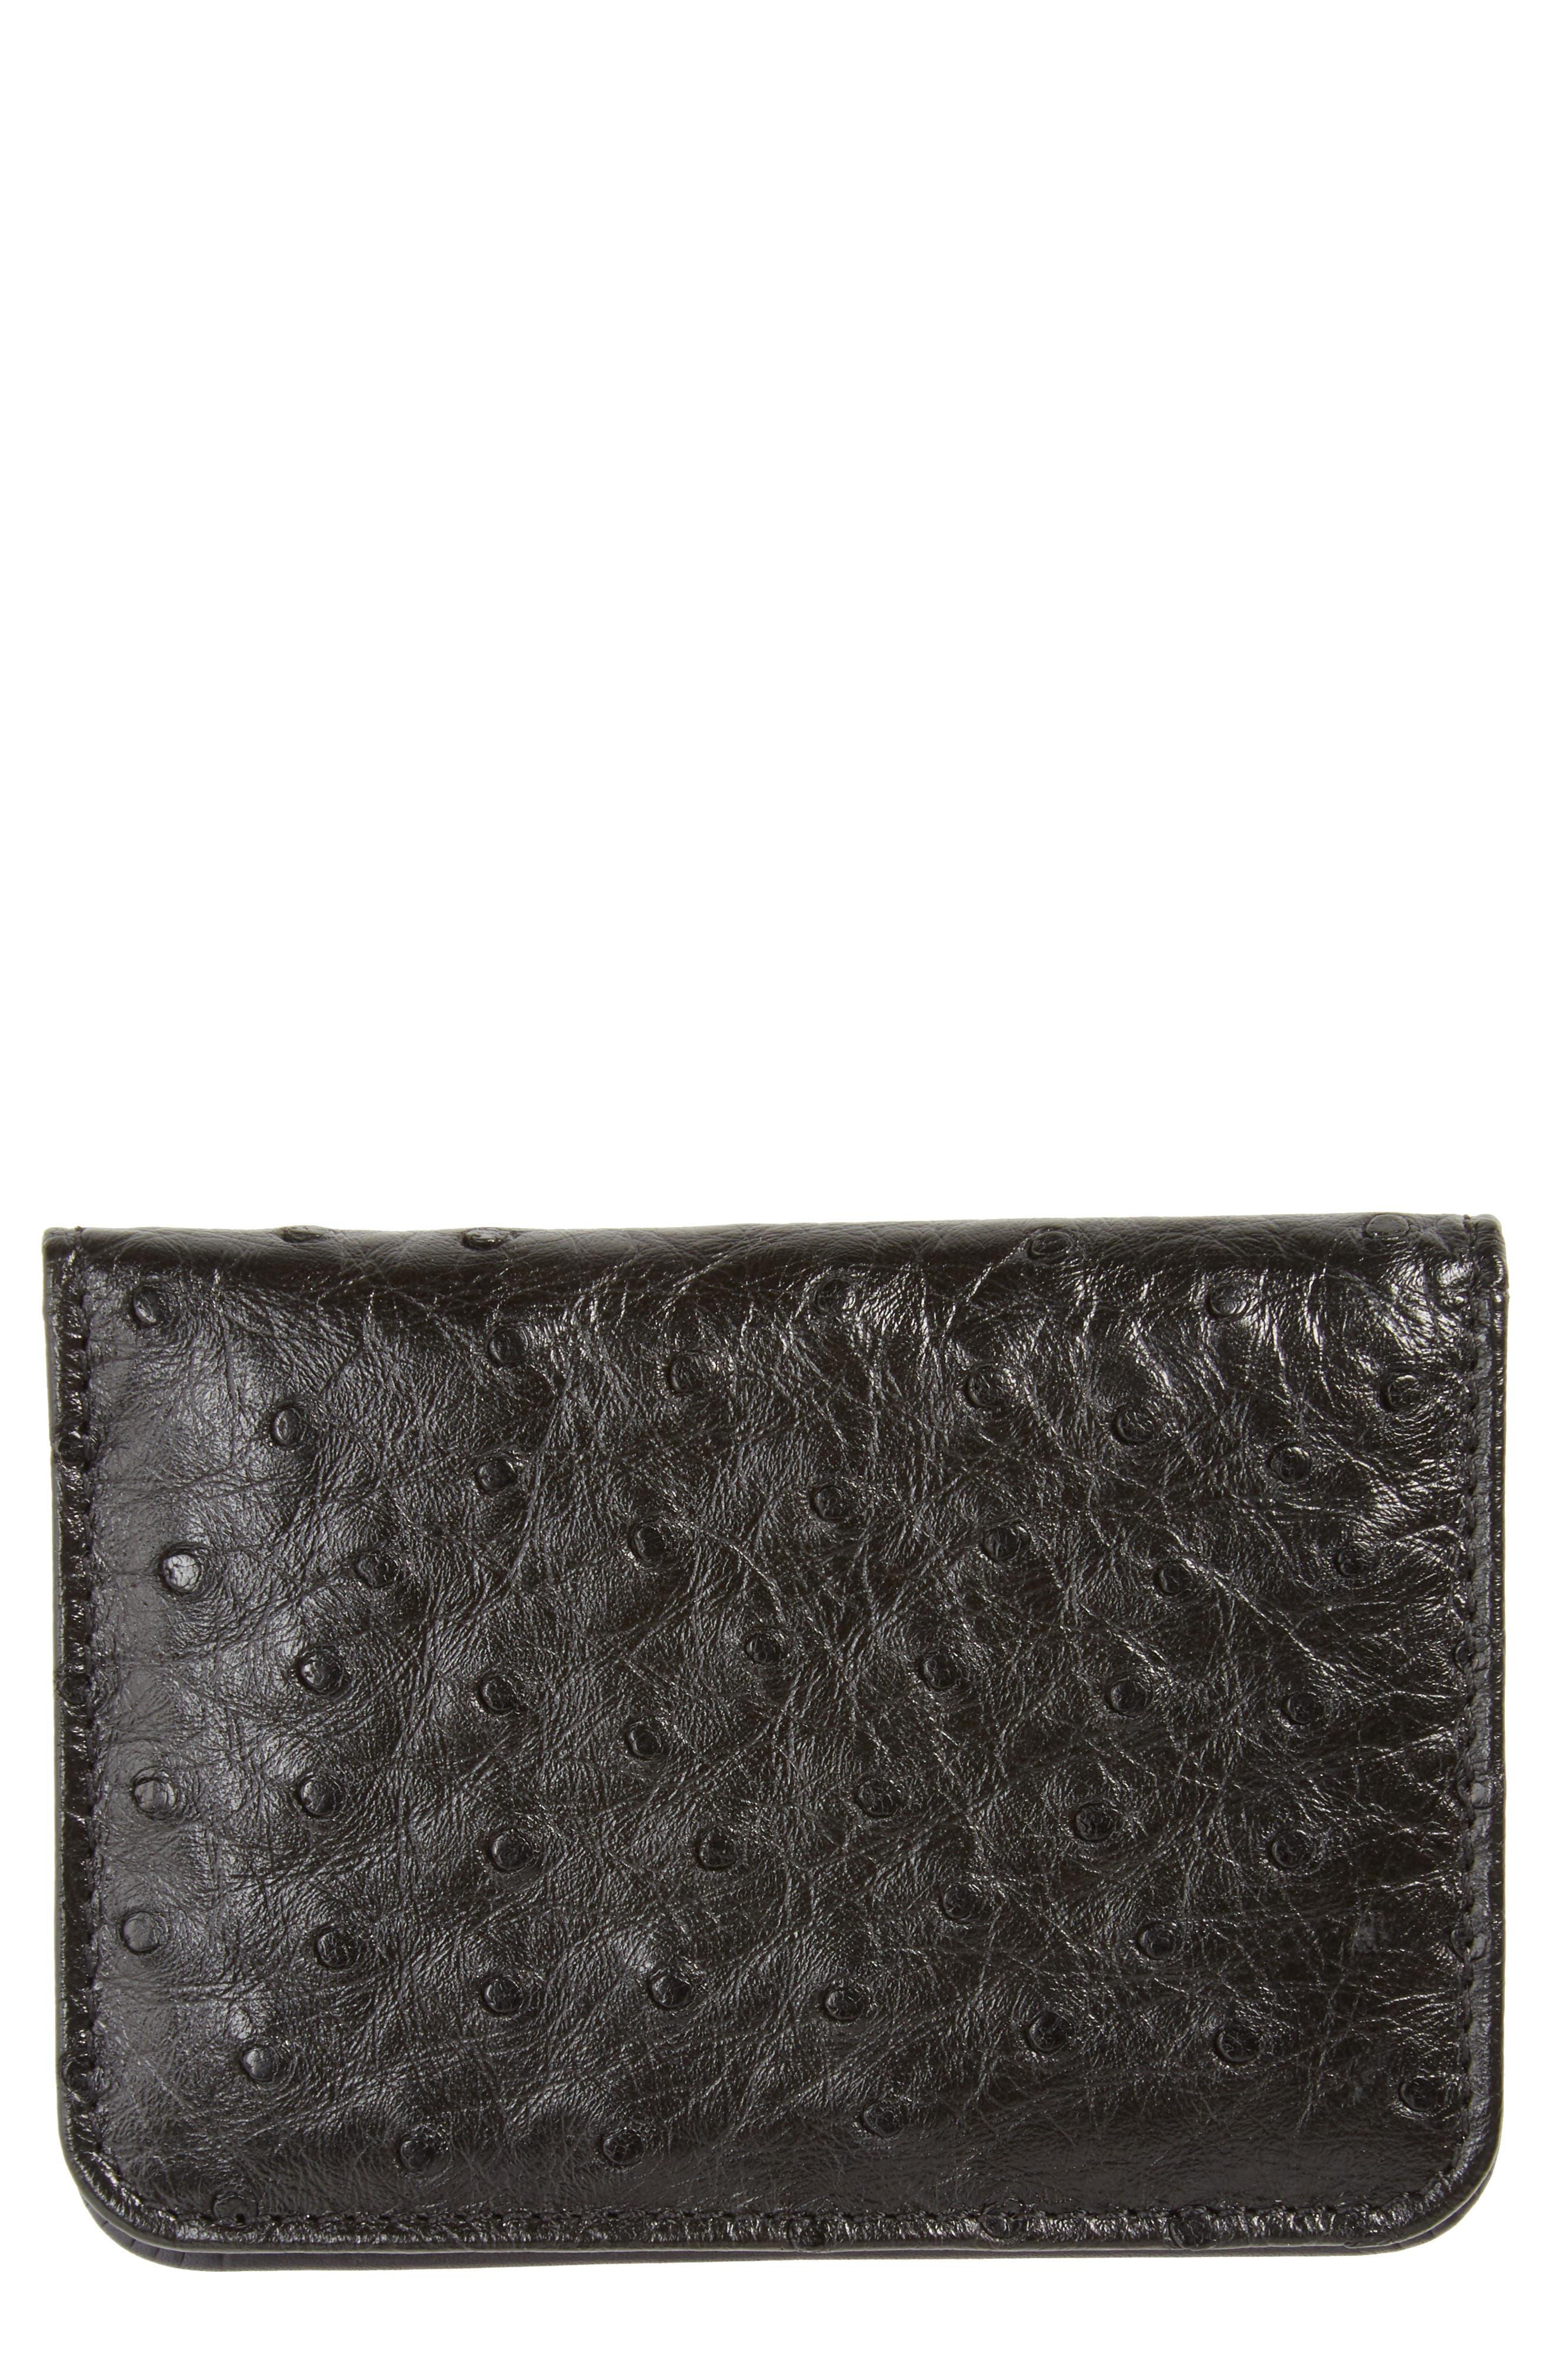 Mezlan Ostrich Leather Card Case